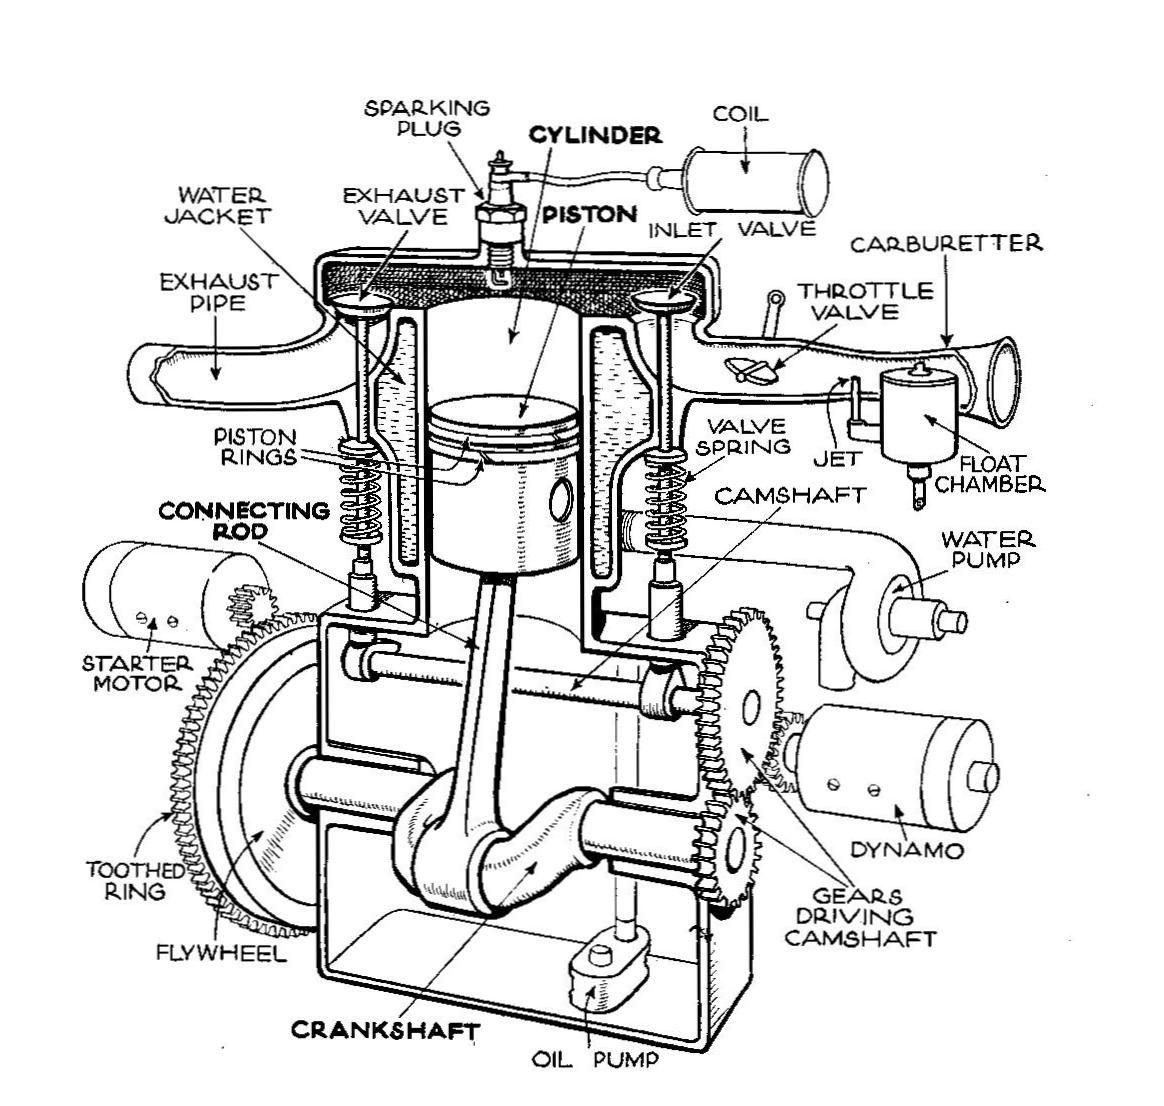 Outstanding Basic Car Parts Diagram Description Single Cylinder T Head Engine Wiring Cloud Licukshollocom